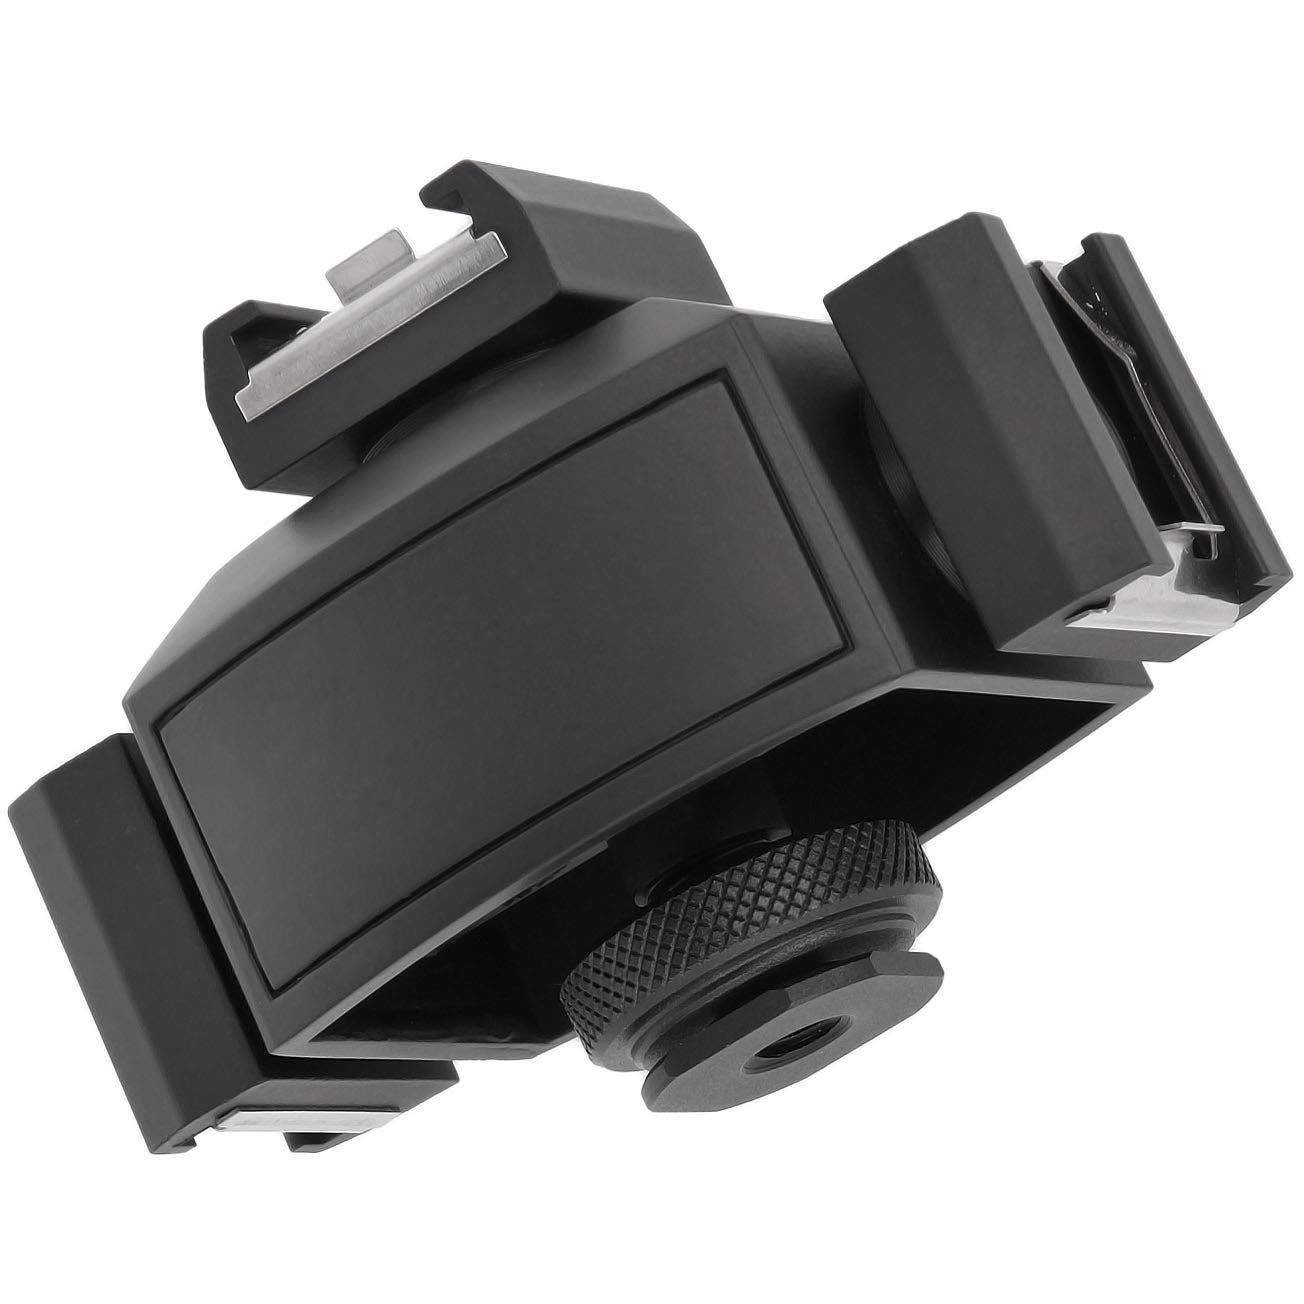 Micnova MQ-THA Espansione per slitta flash 3 ingressi per attacco flash per utilizzare pi/ù accessori per fotocamera contemporaneamente adattatore per attacco hot shoe